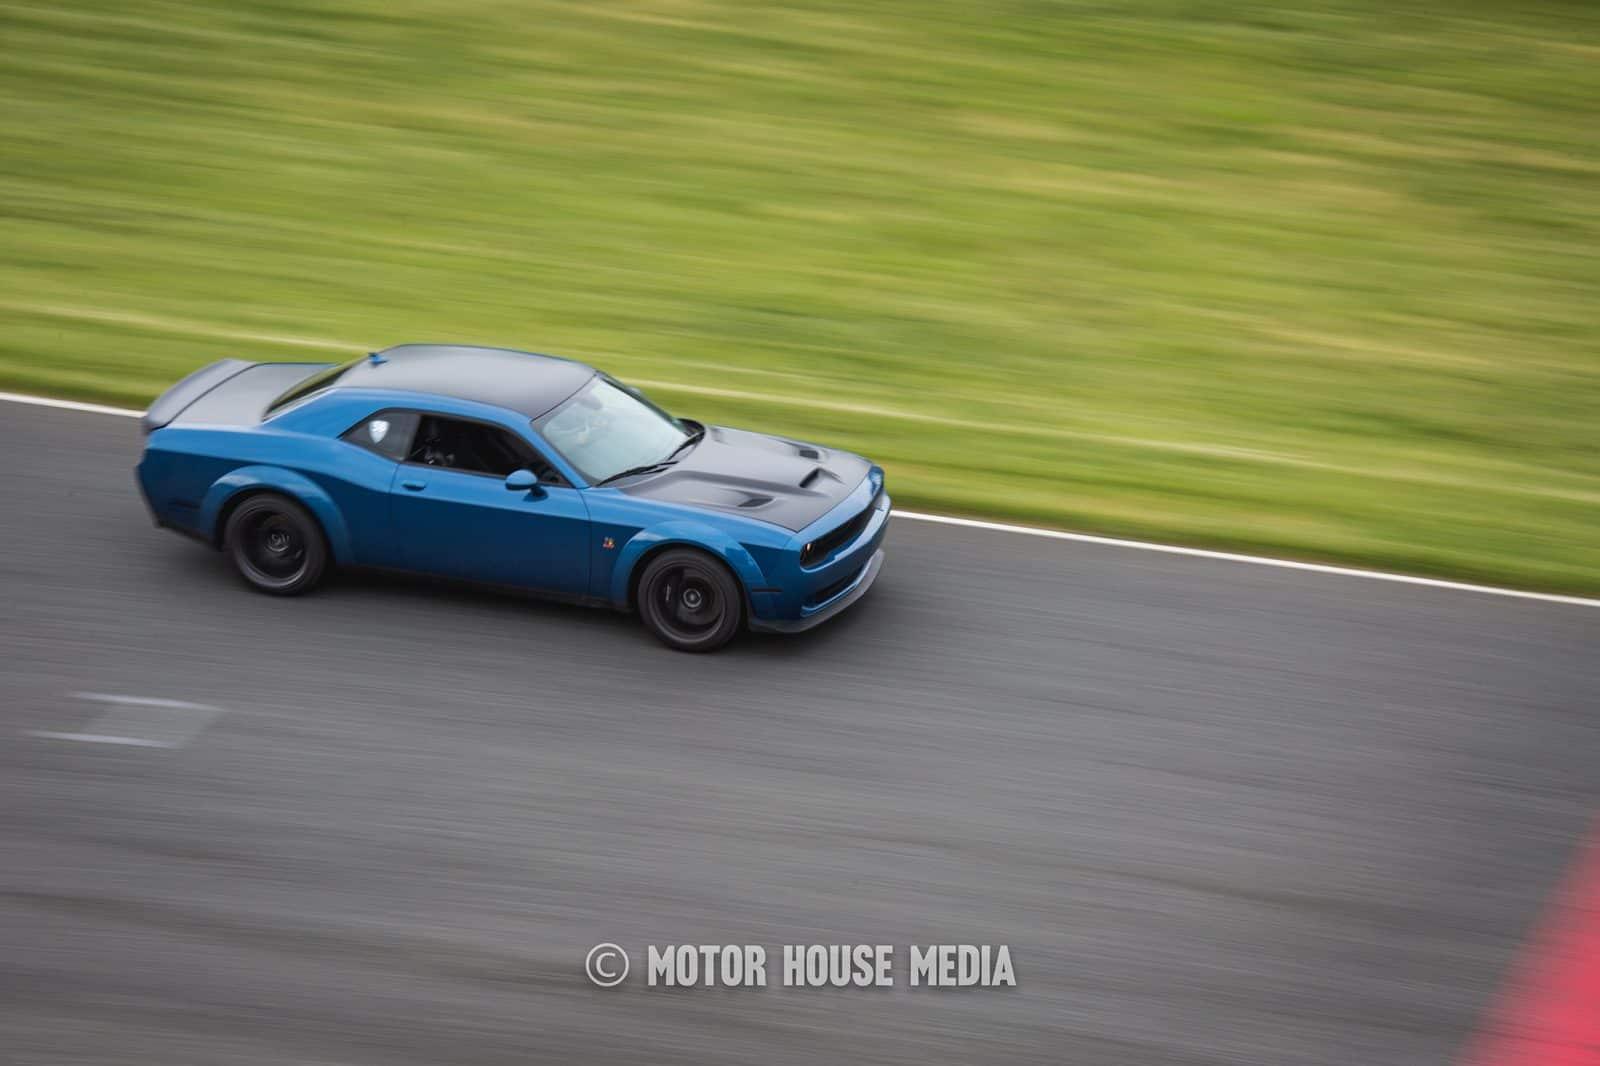 Dodge Challenger roll racing